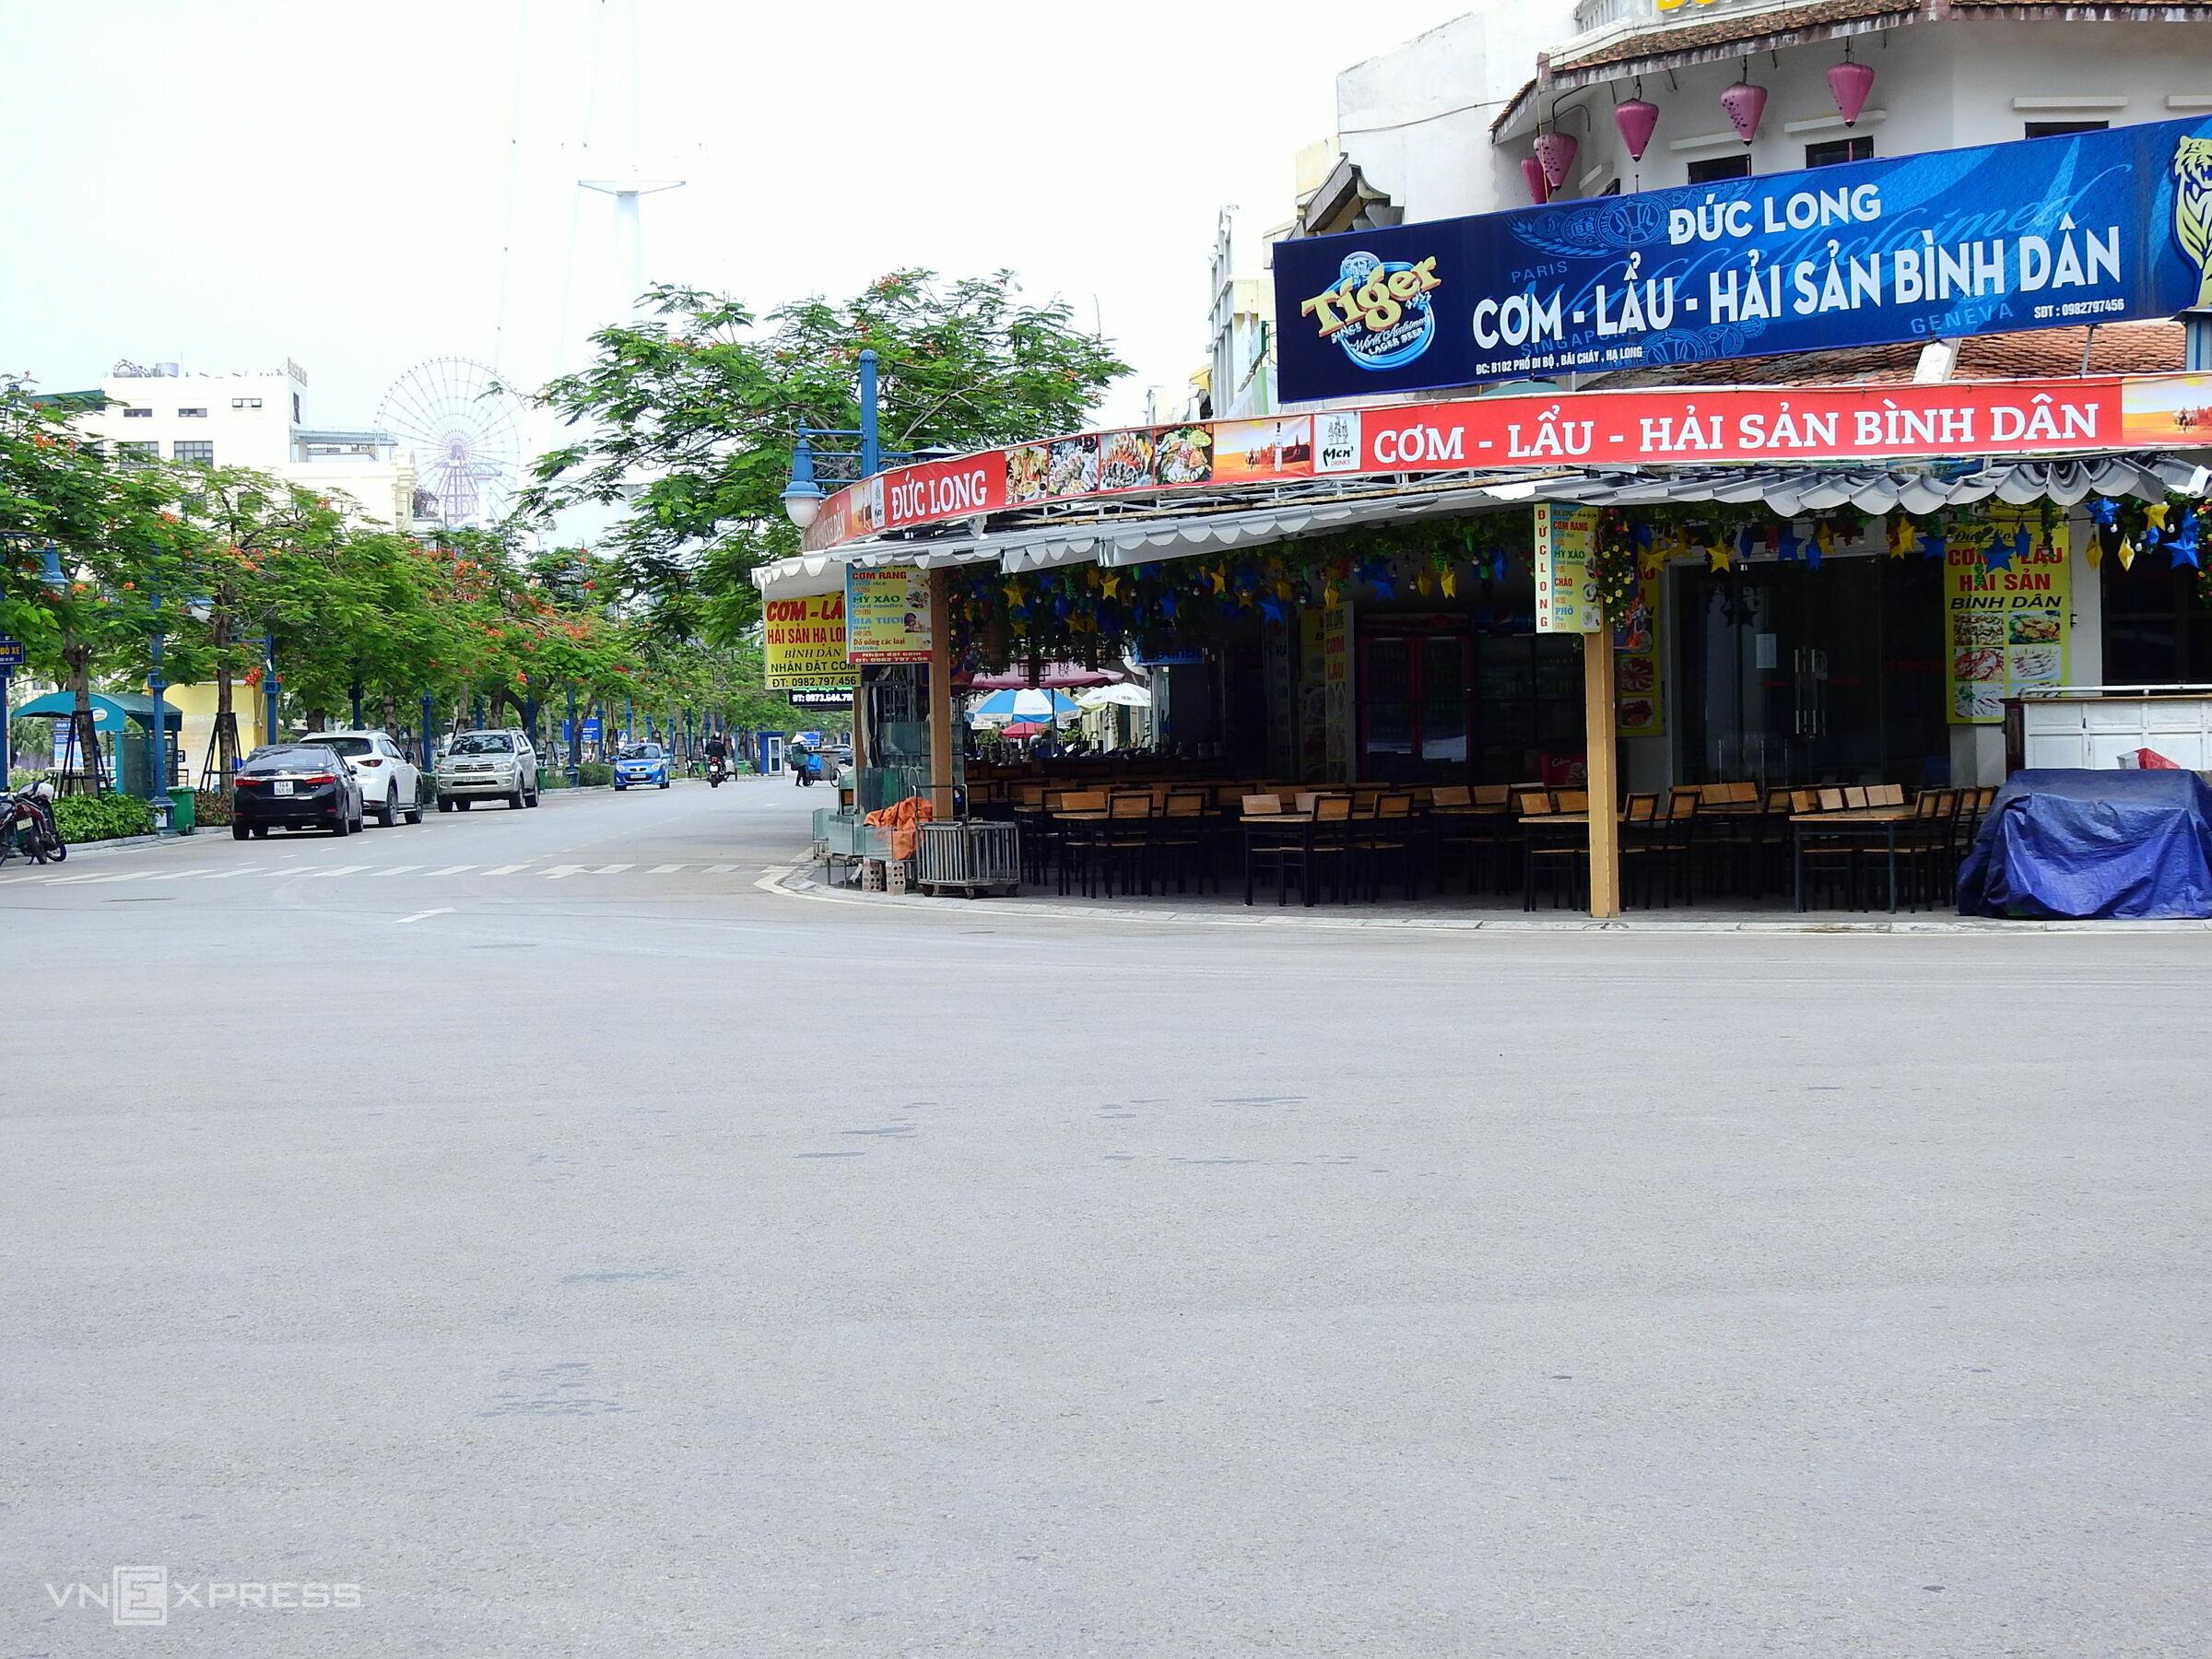 External visitor ban desolates once-busy Ha Long Bay